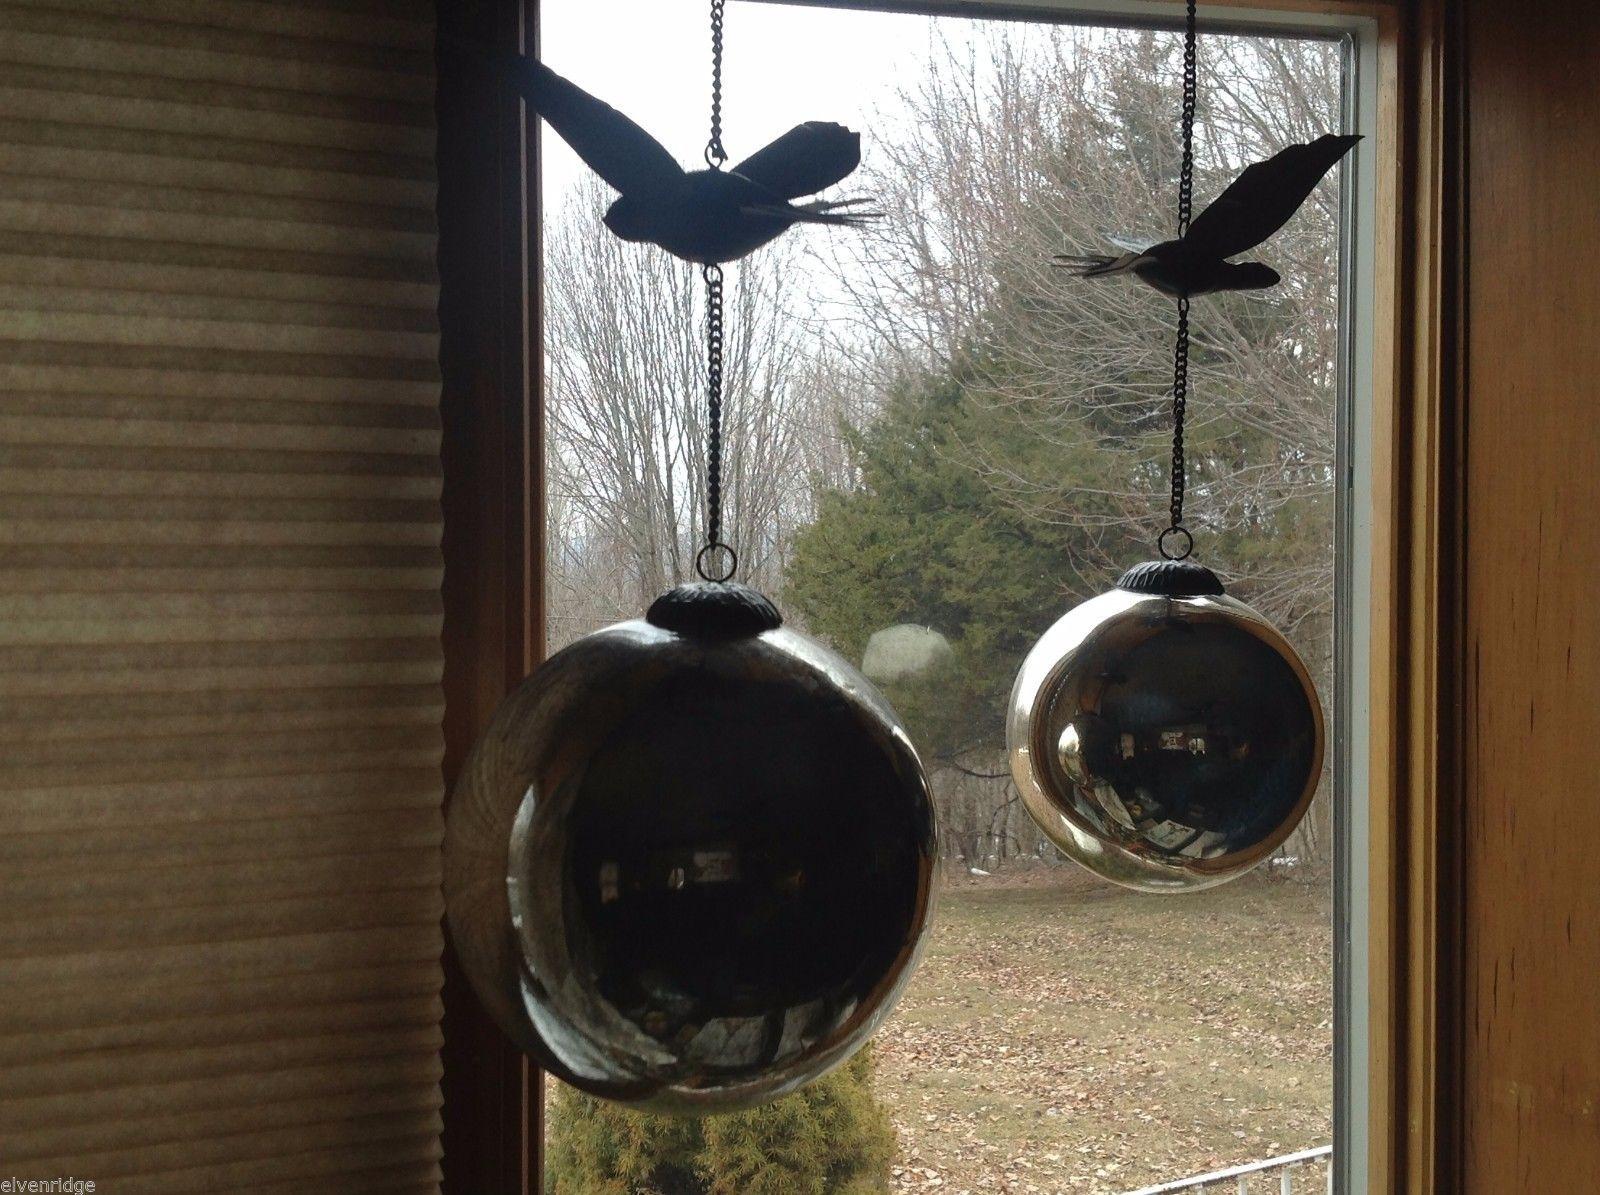 Massive Vintage Look Metallic Ball Ornament on Chain with Bird